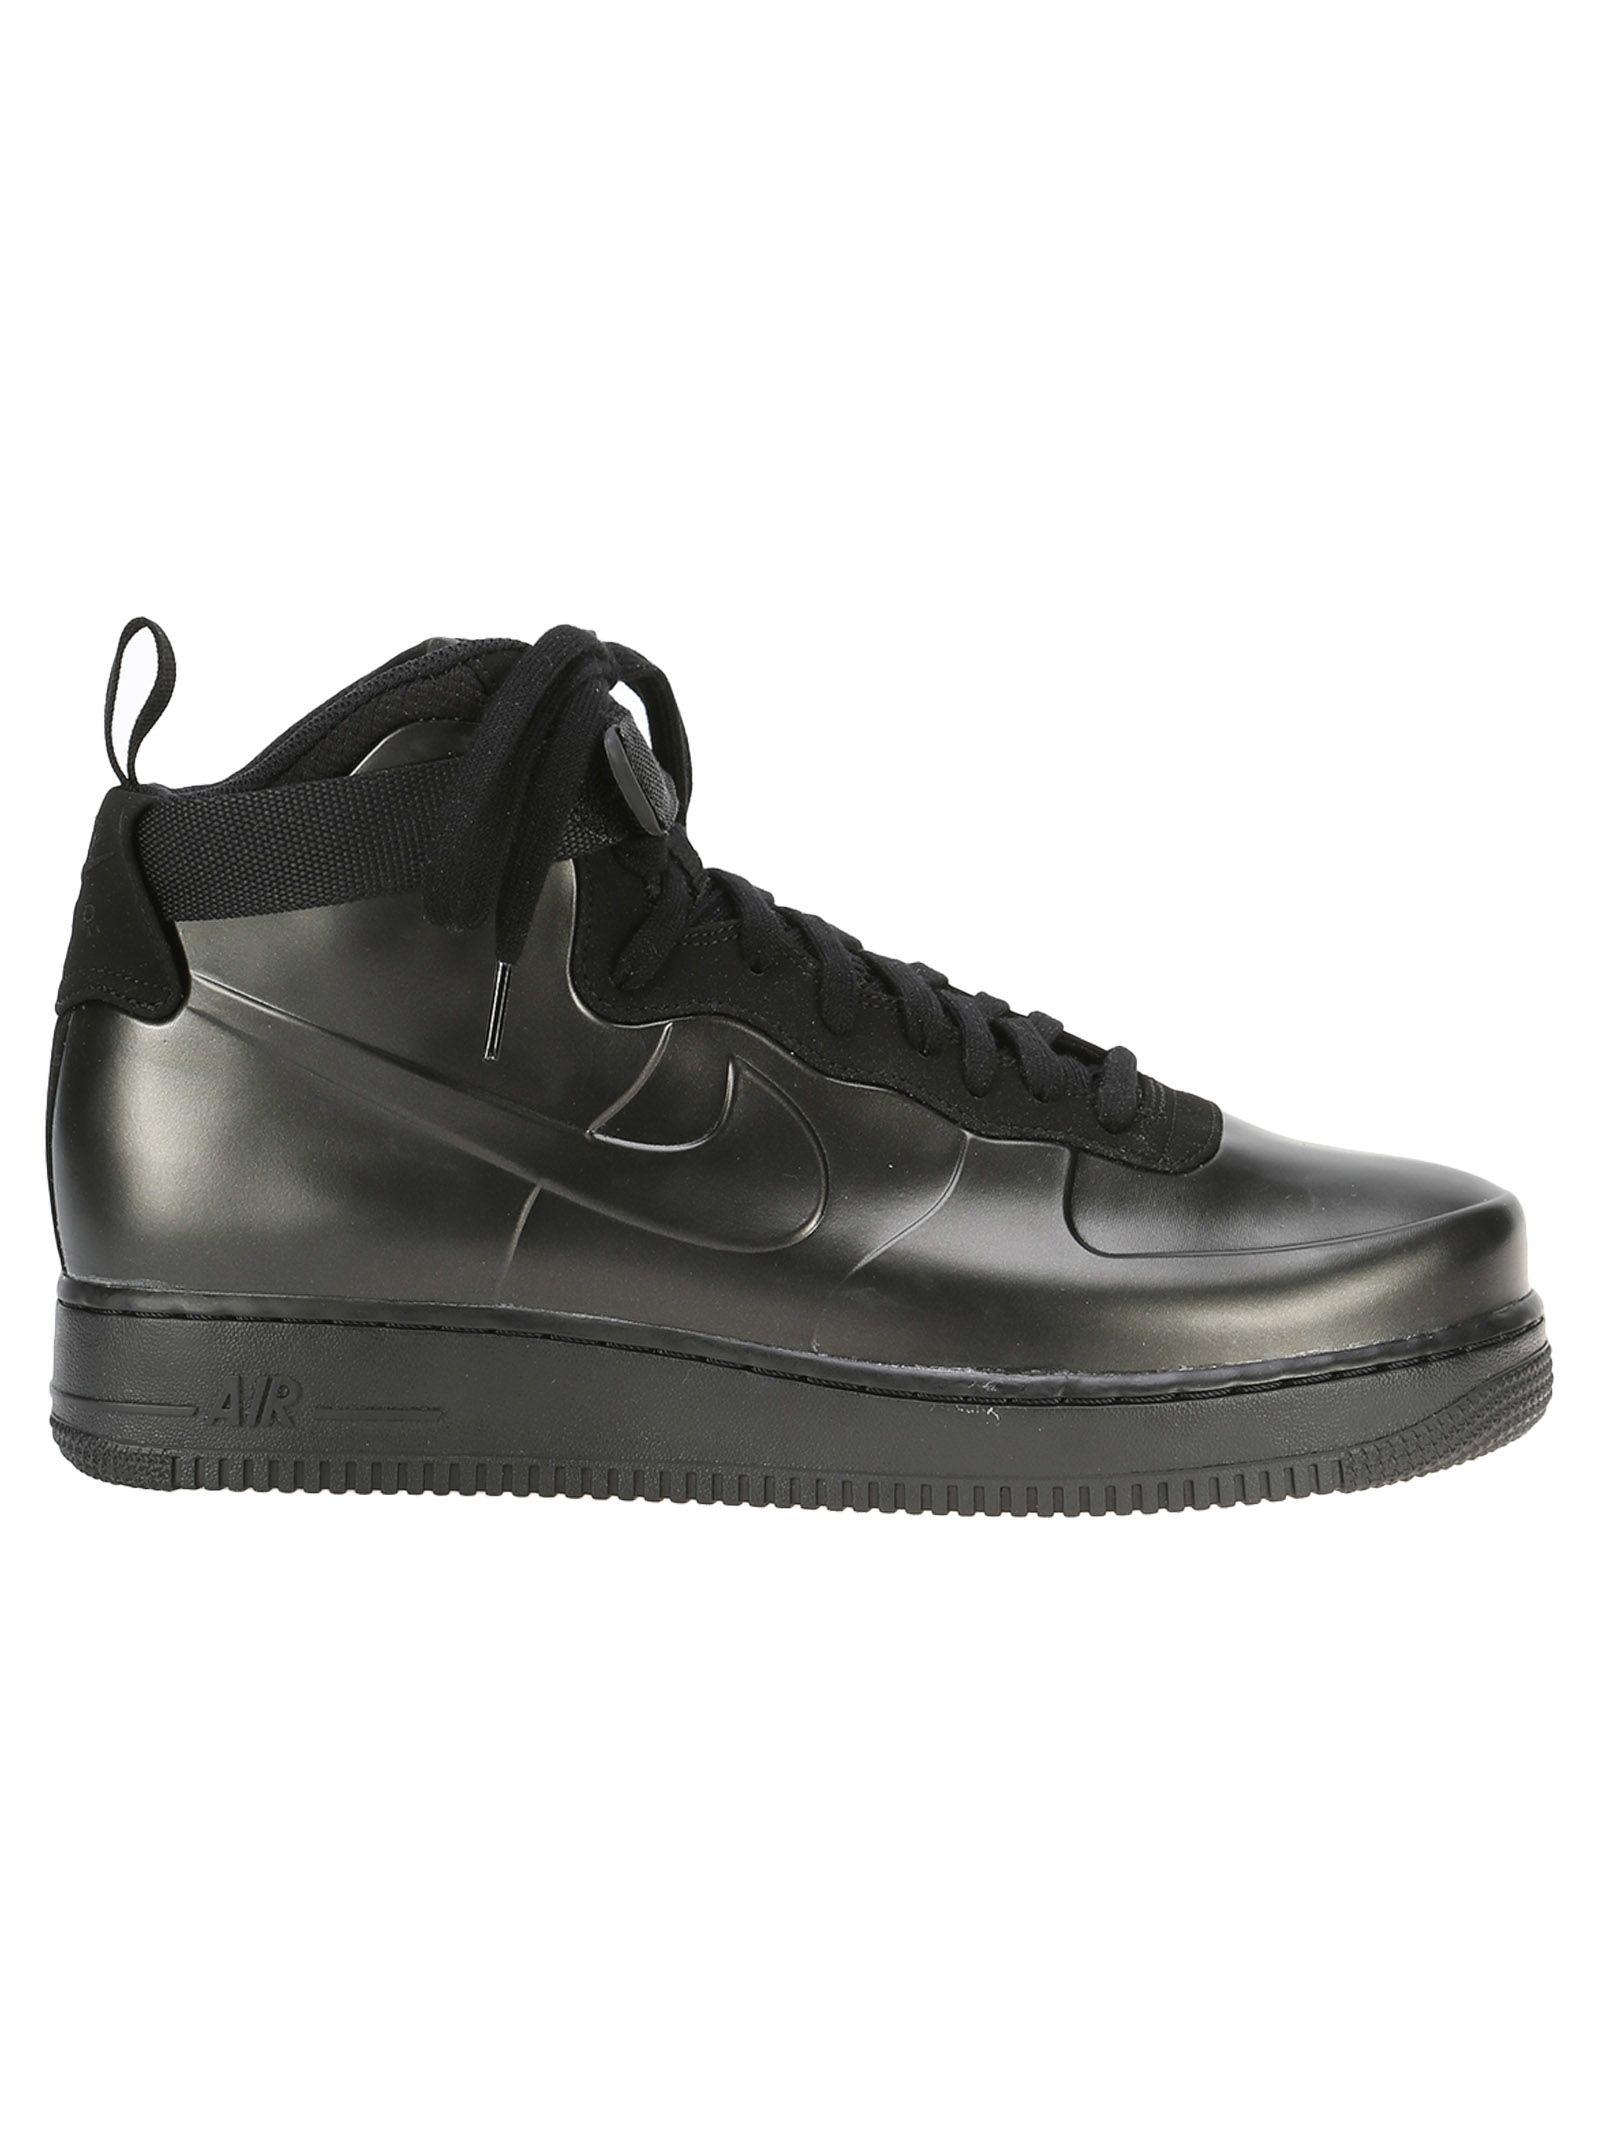 Nike Leather Black Sneakers